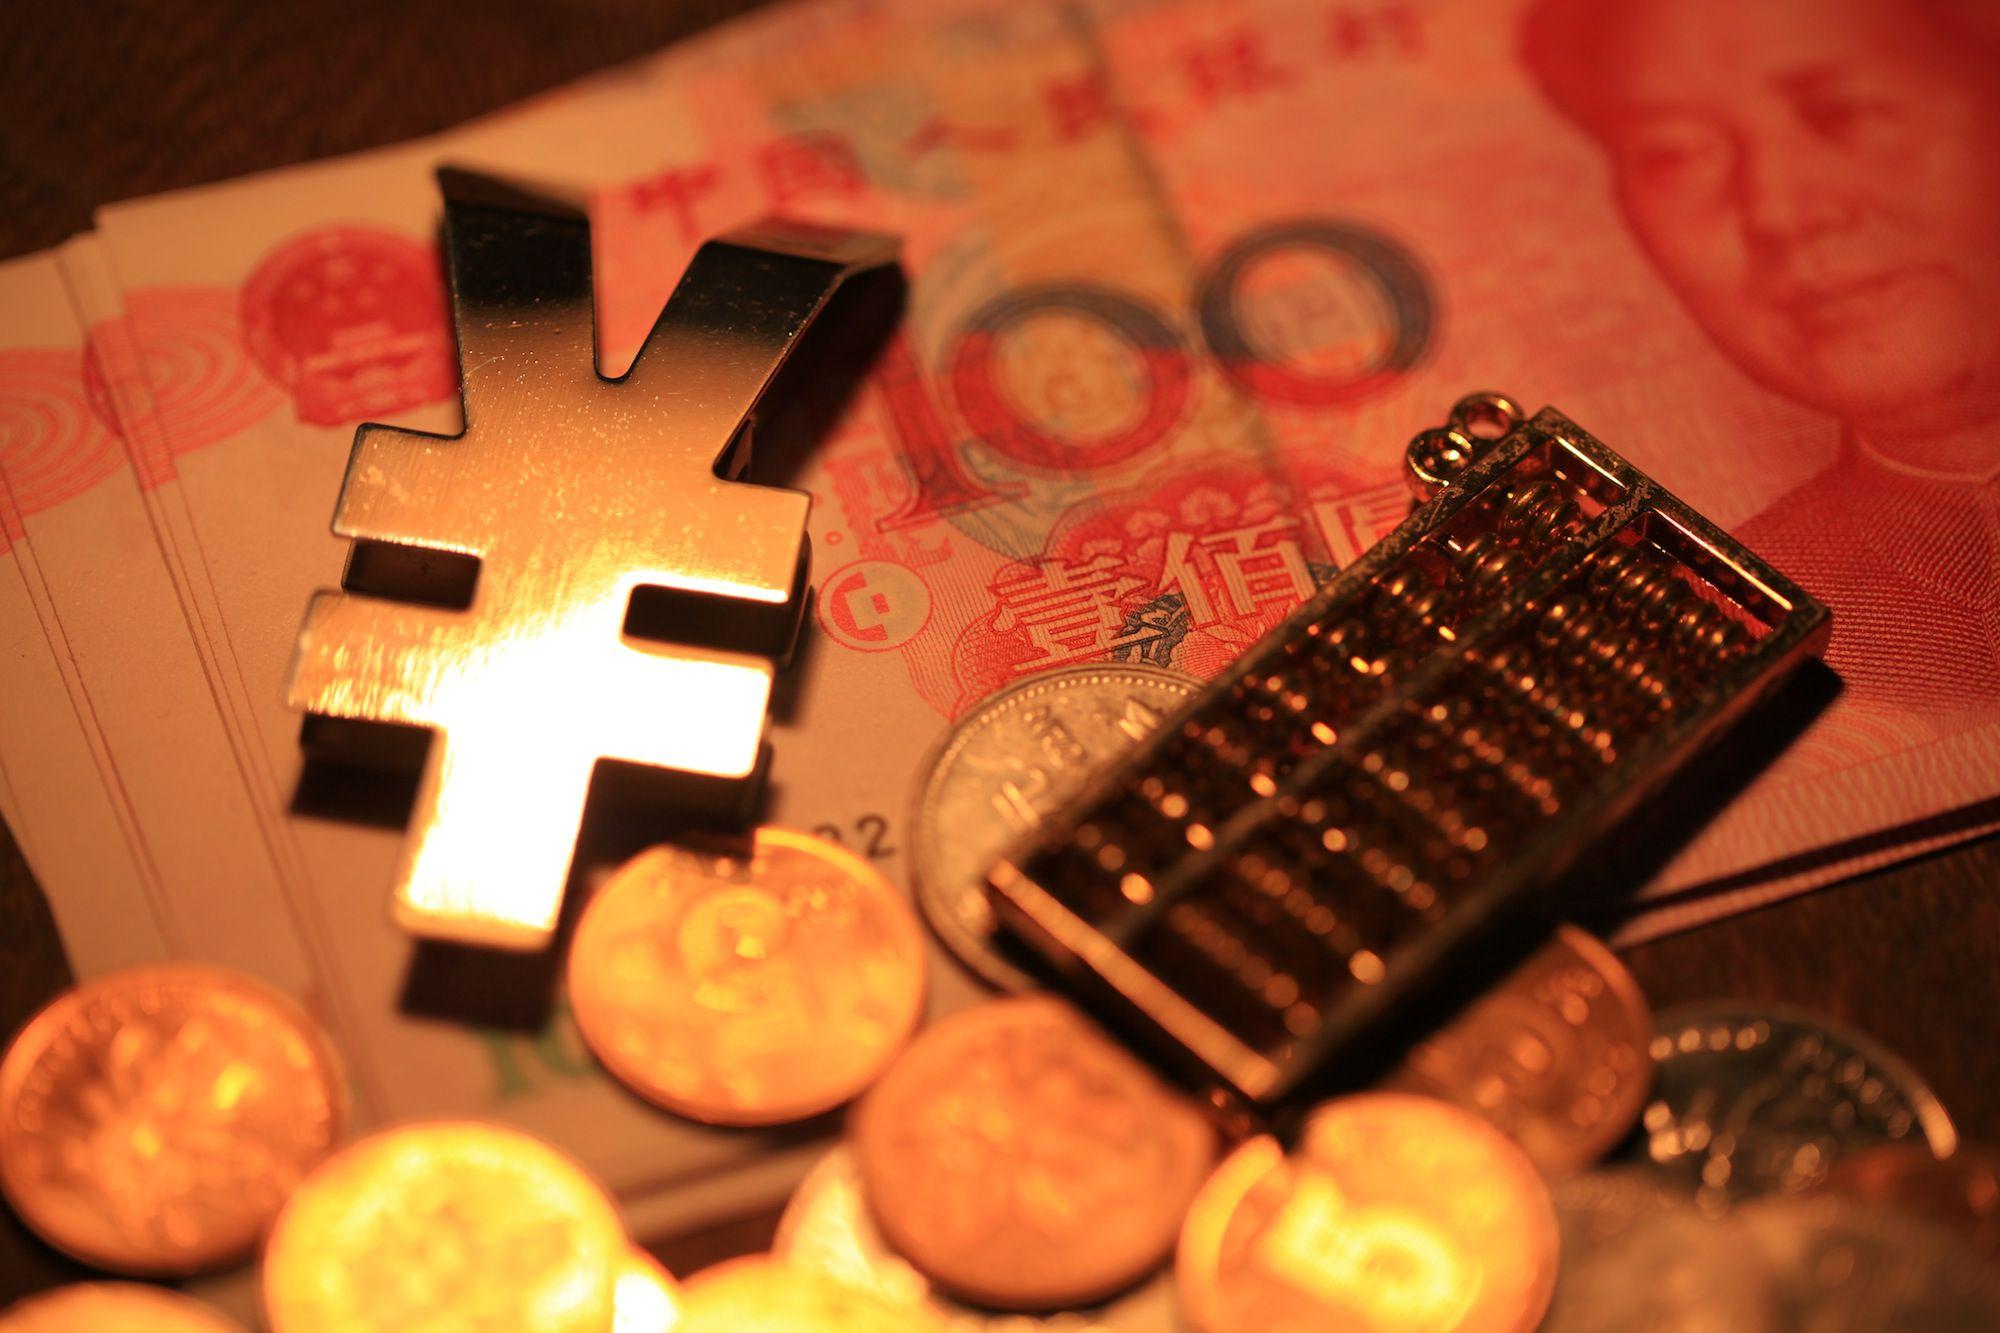 The Four Largest Emerging Markets (BRICs)